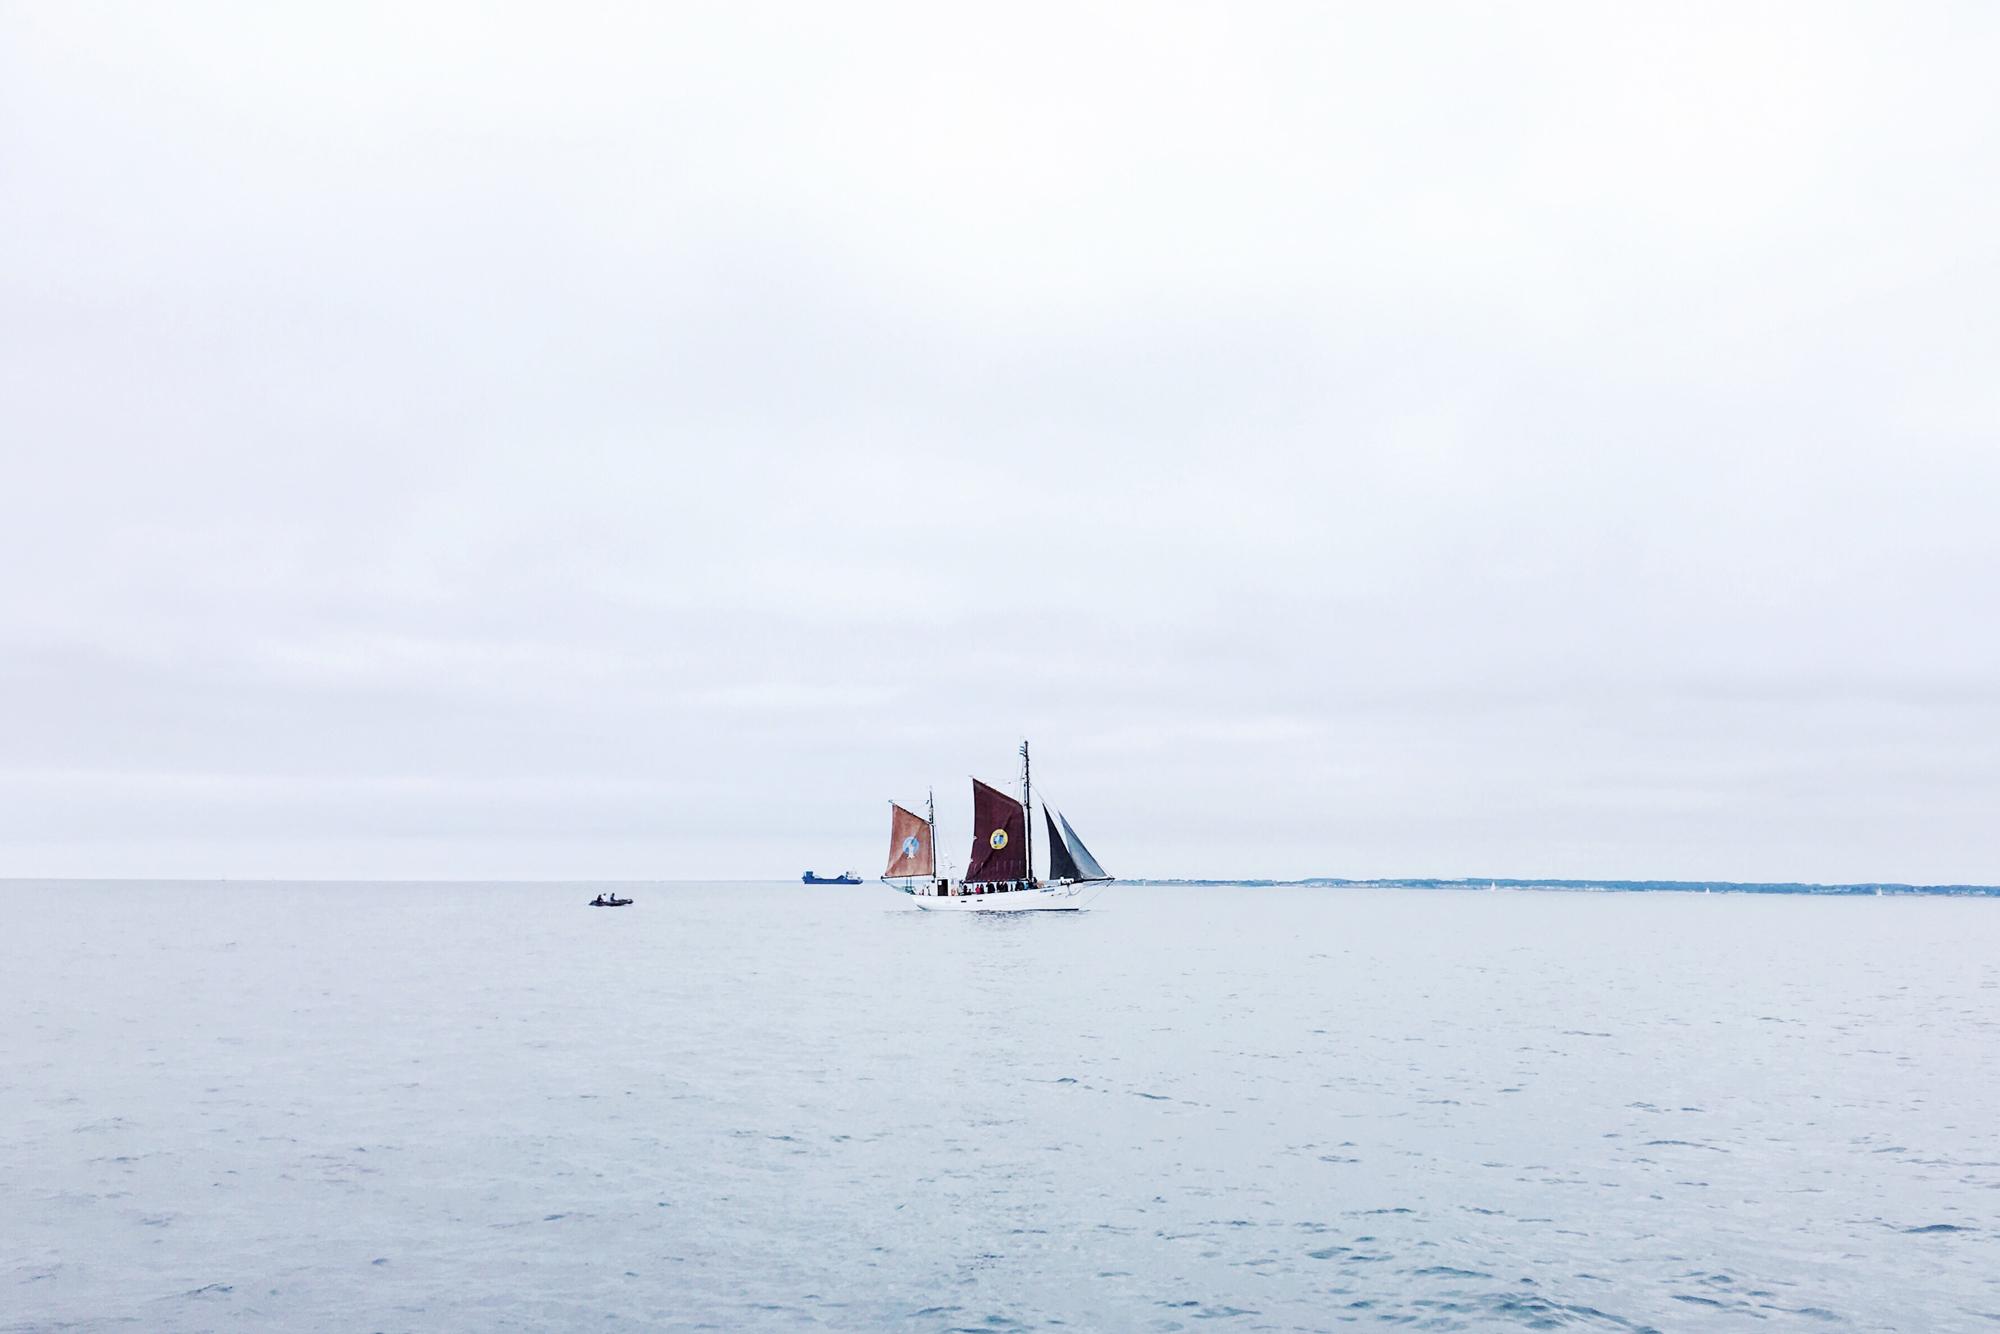 ferry-groix-lorient-003g